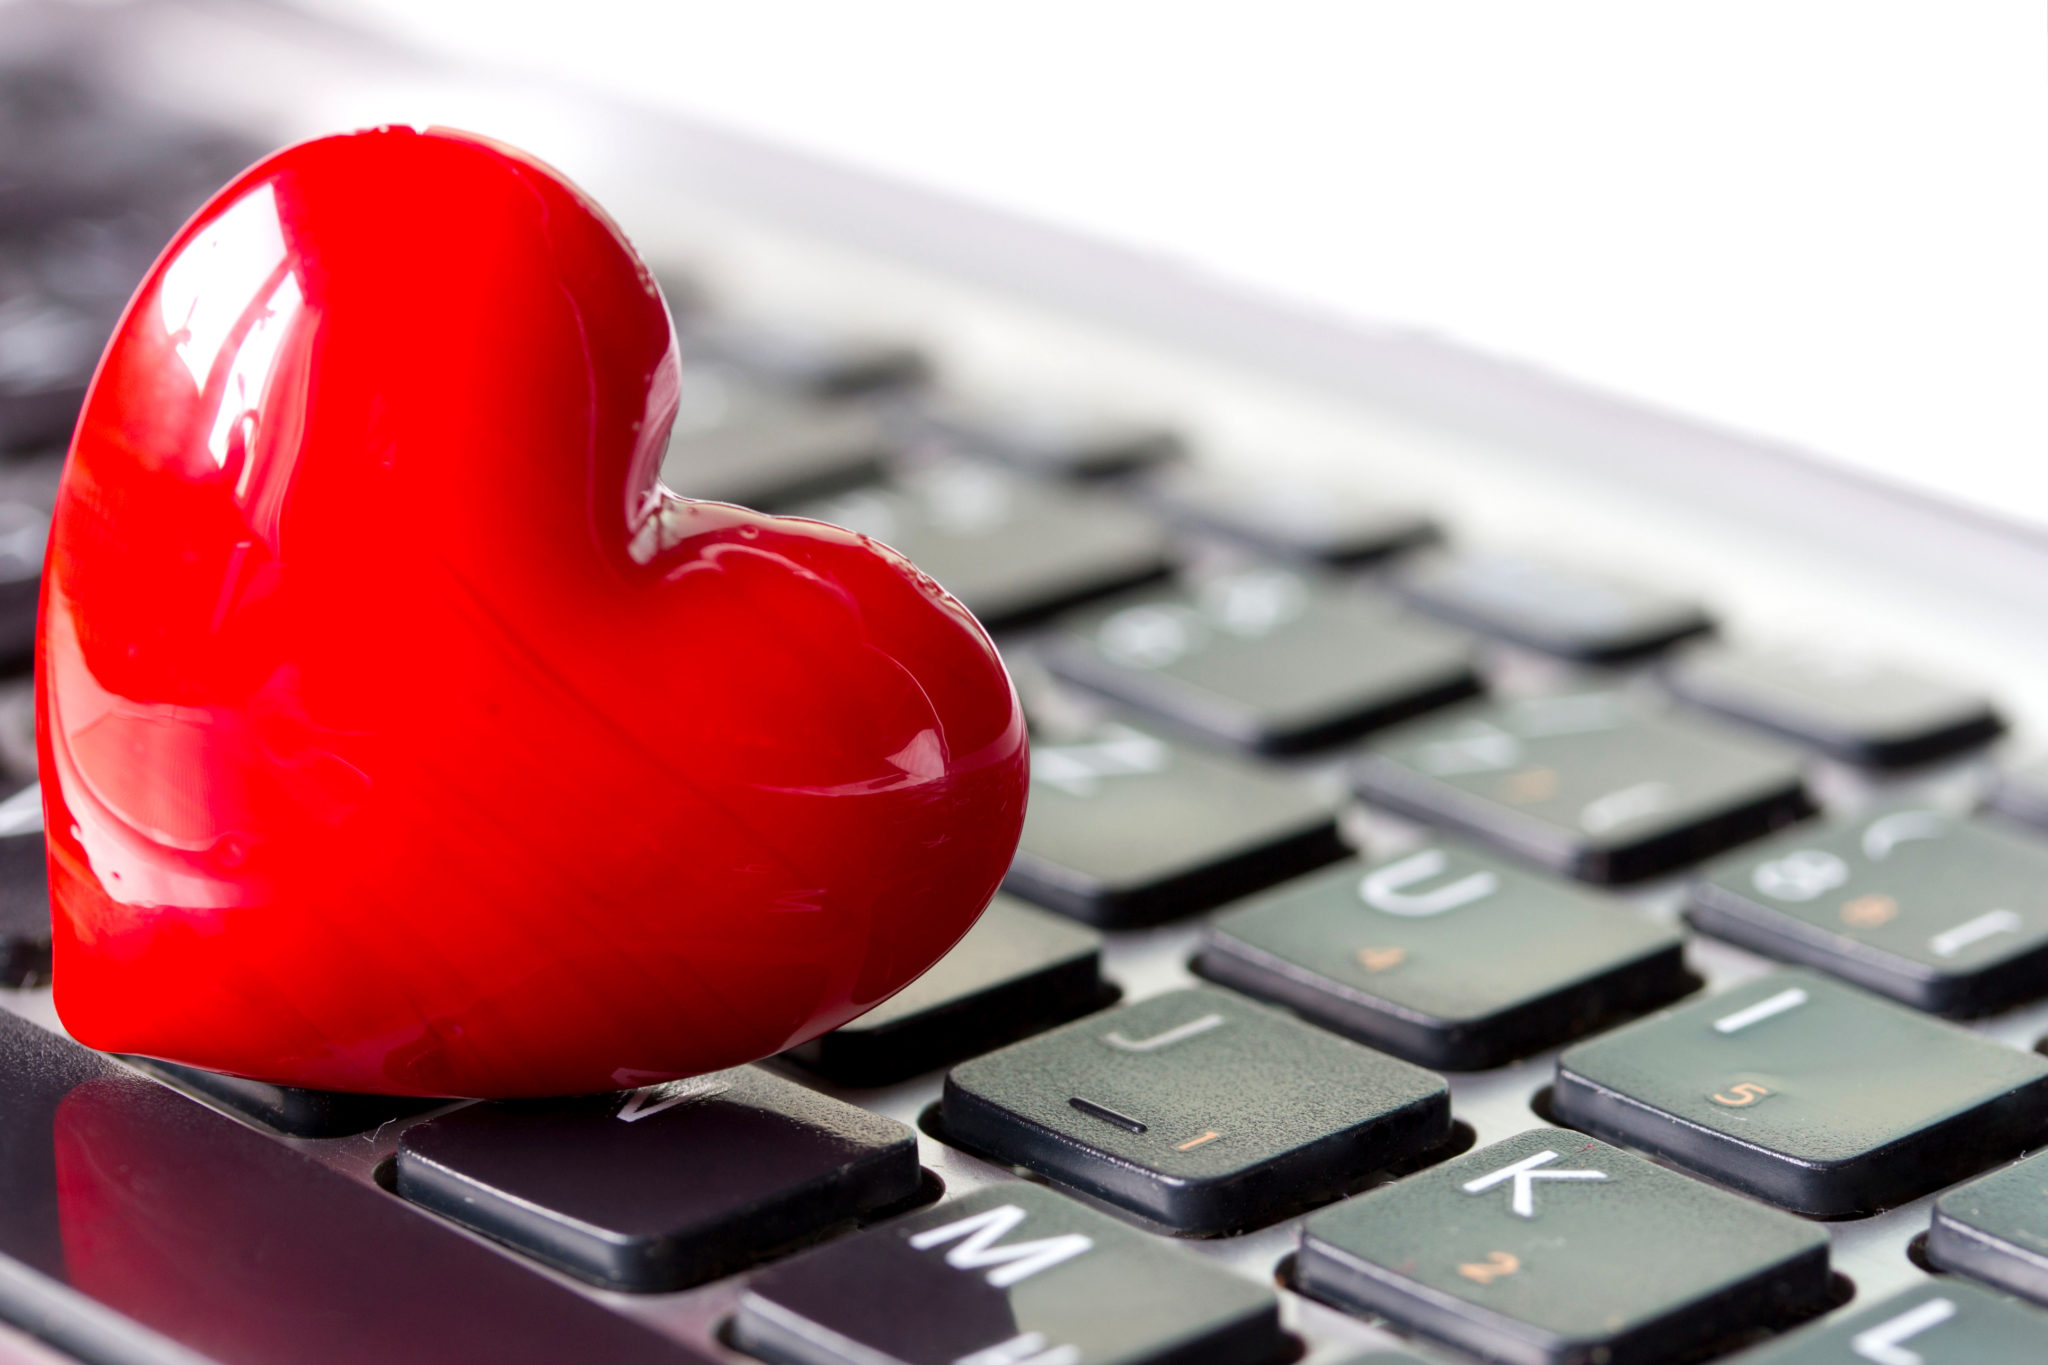 How long to find a boyfriend online